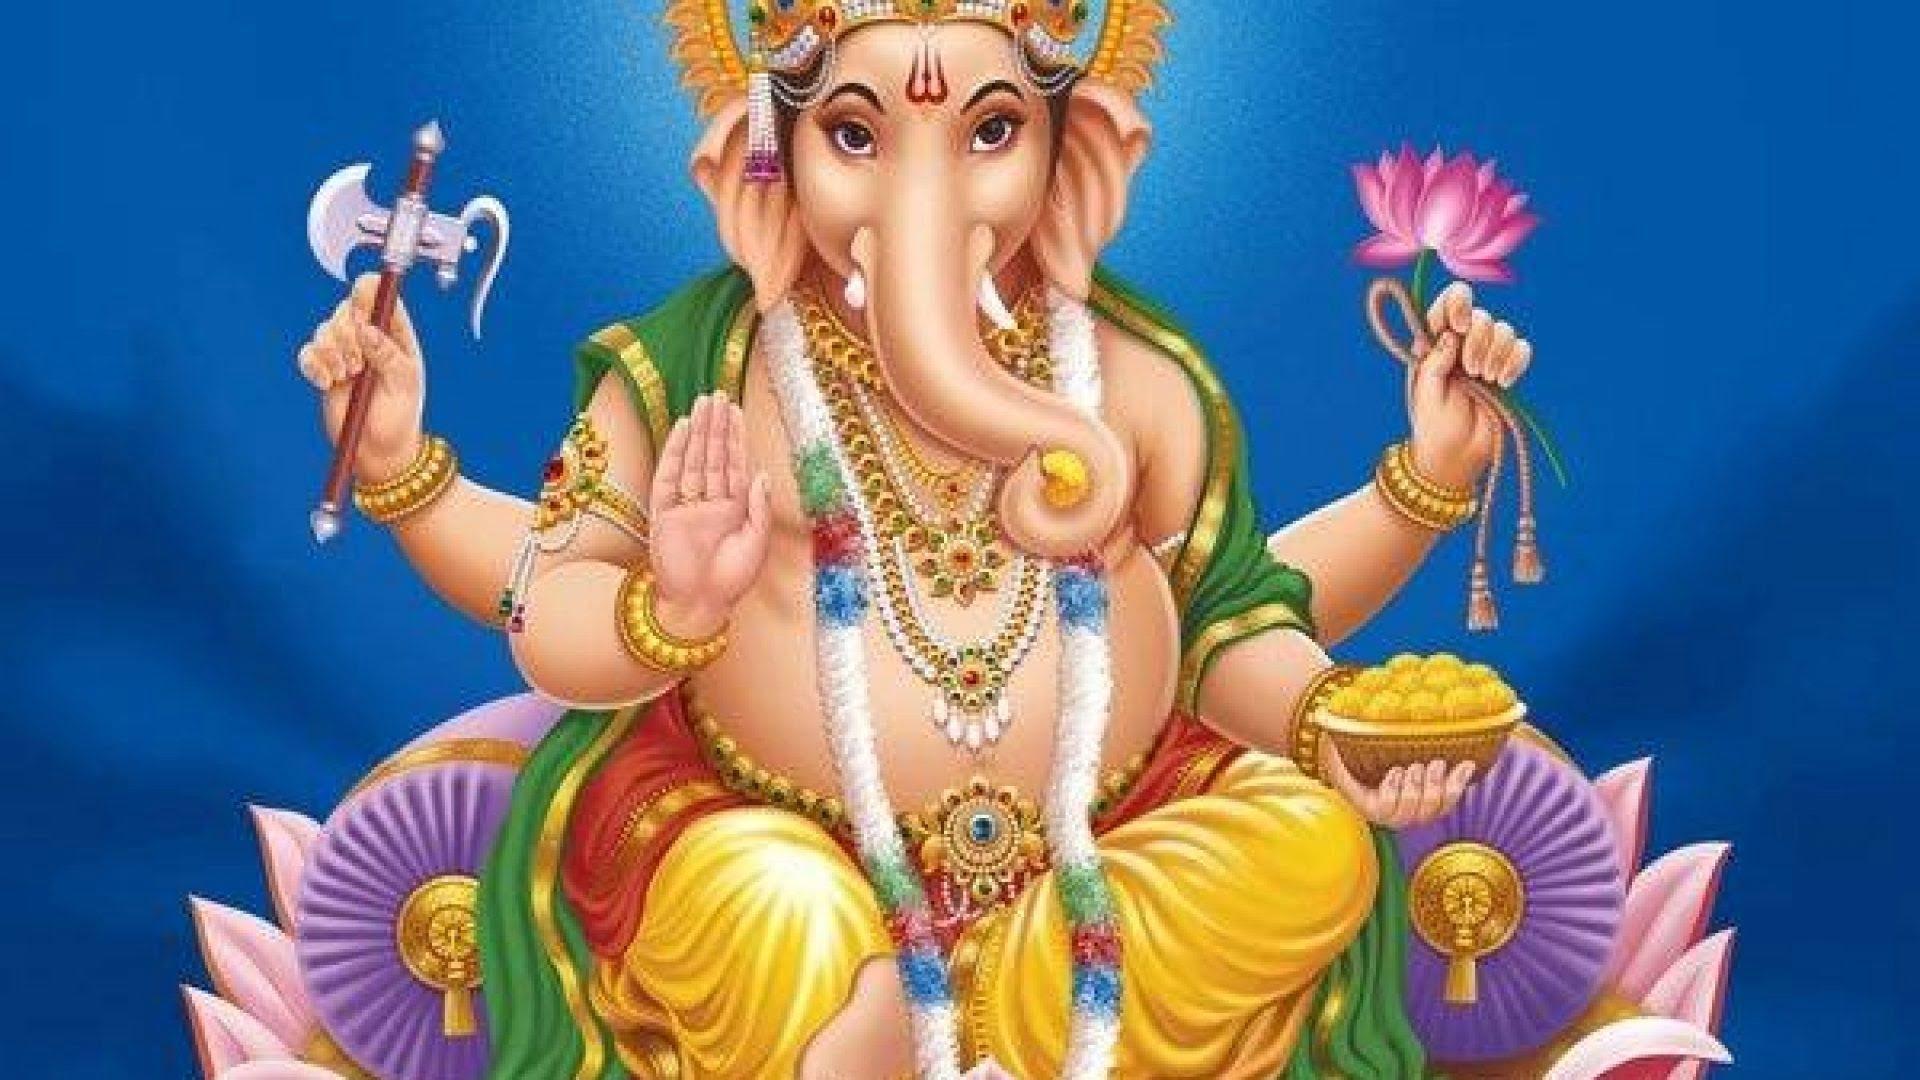 Shri Ganesha HD Images